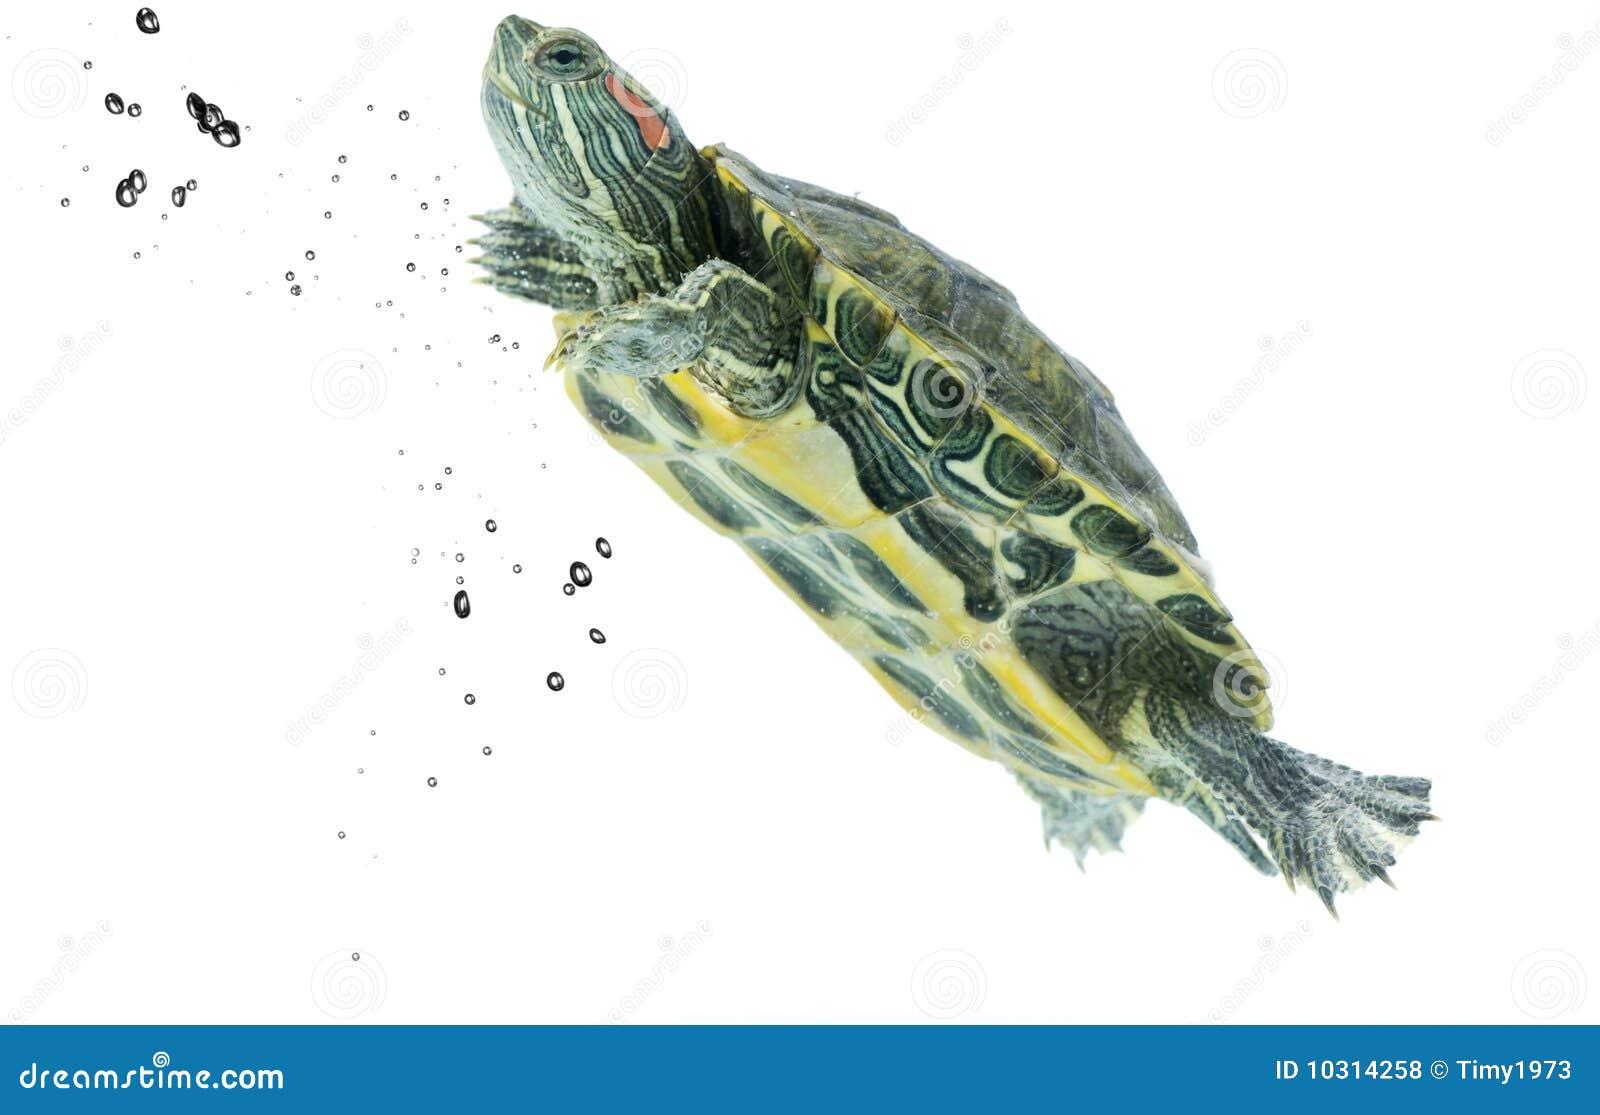 Swimming Turtle Royalty Free Stock Photos - Image: 10314258